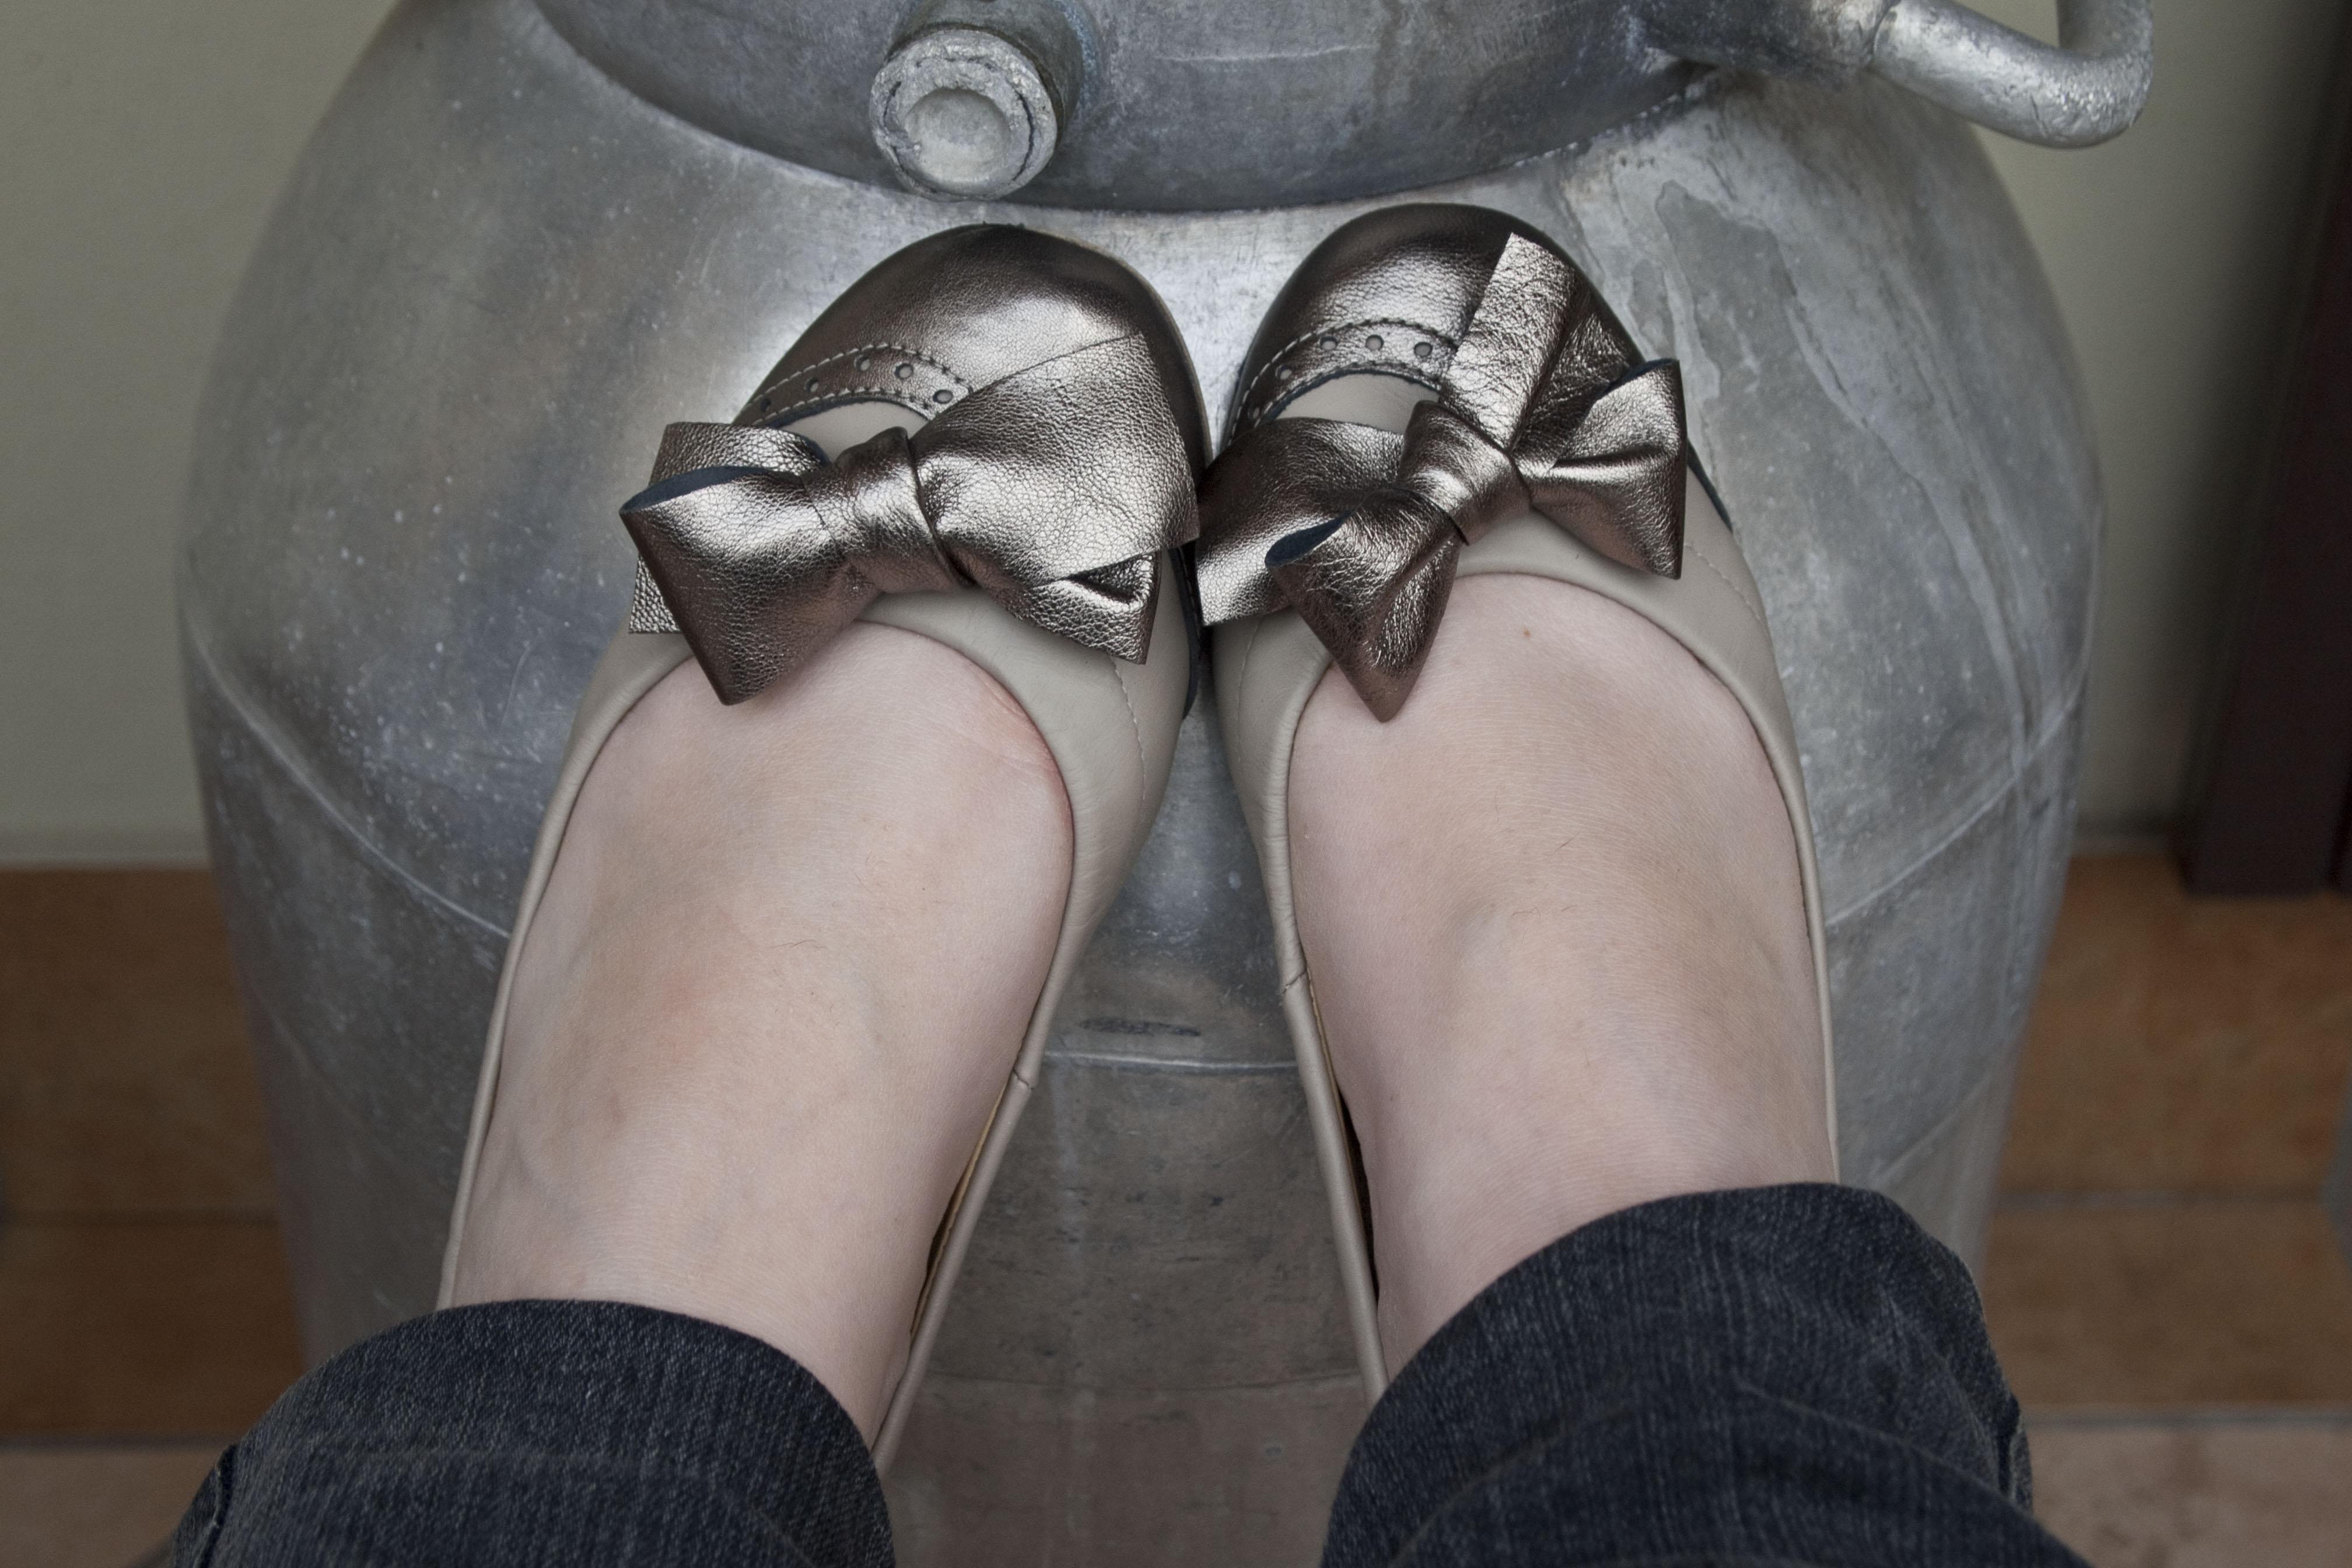 Shoe Flat Flat Bow Room15 Shoes Shoe Room15 Flat Bow Bow Shoe Room15 Shoes Y7y6vgfIb